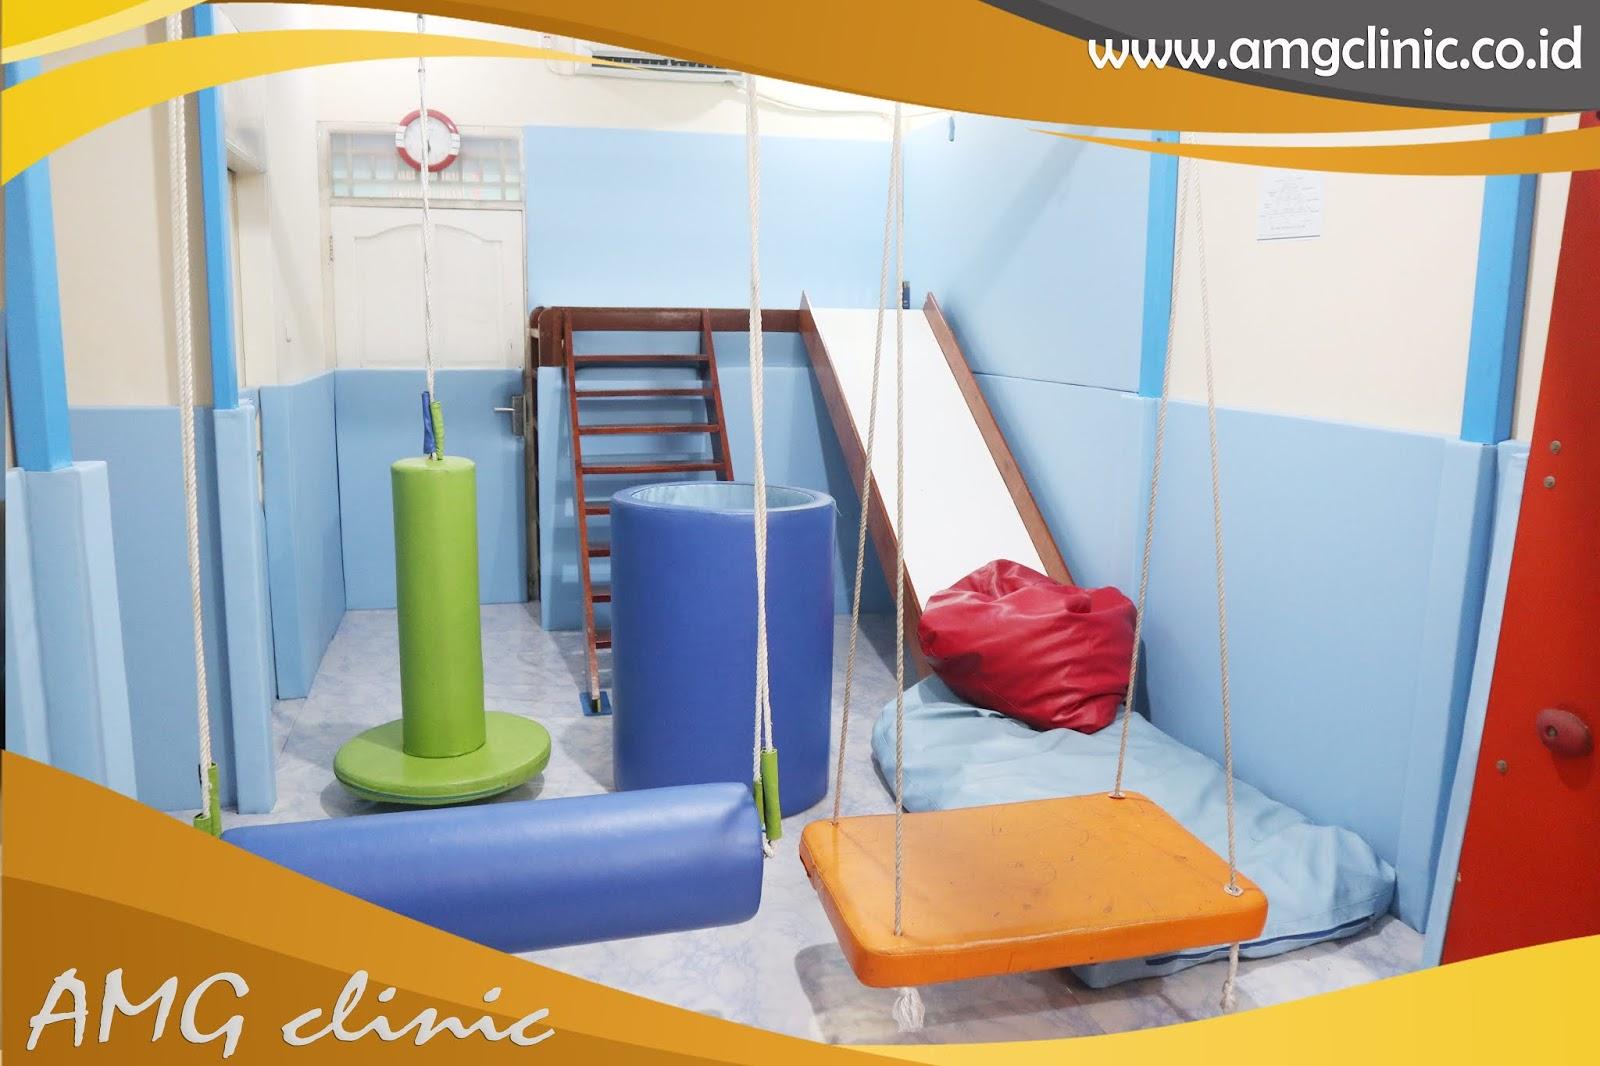 ruang terapi amg clinic